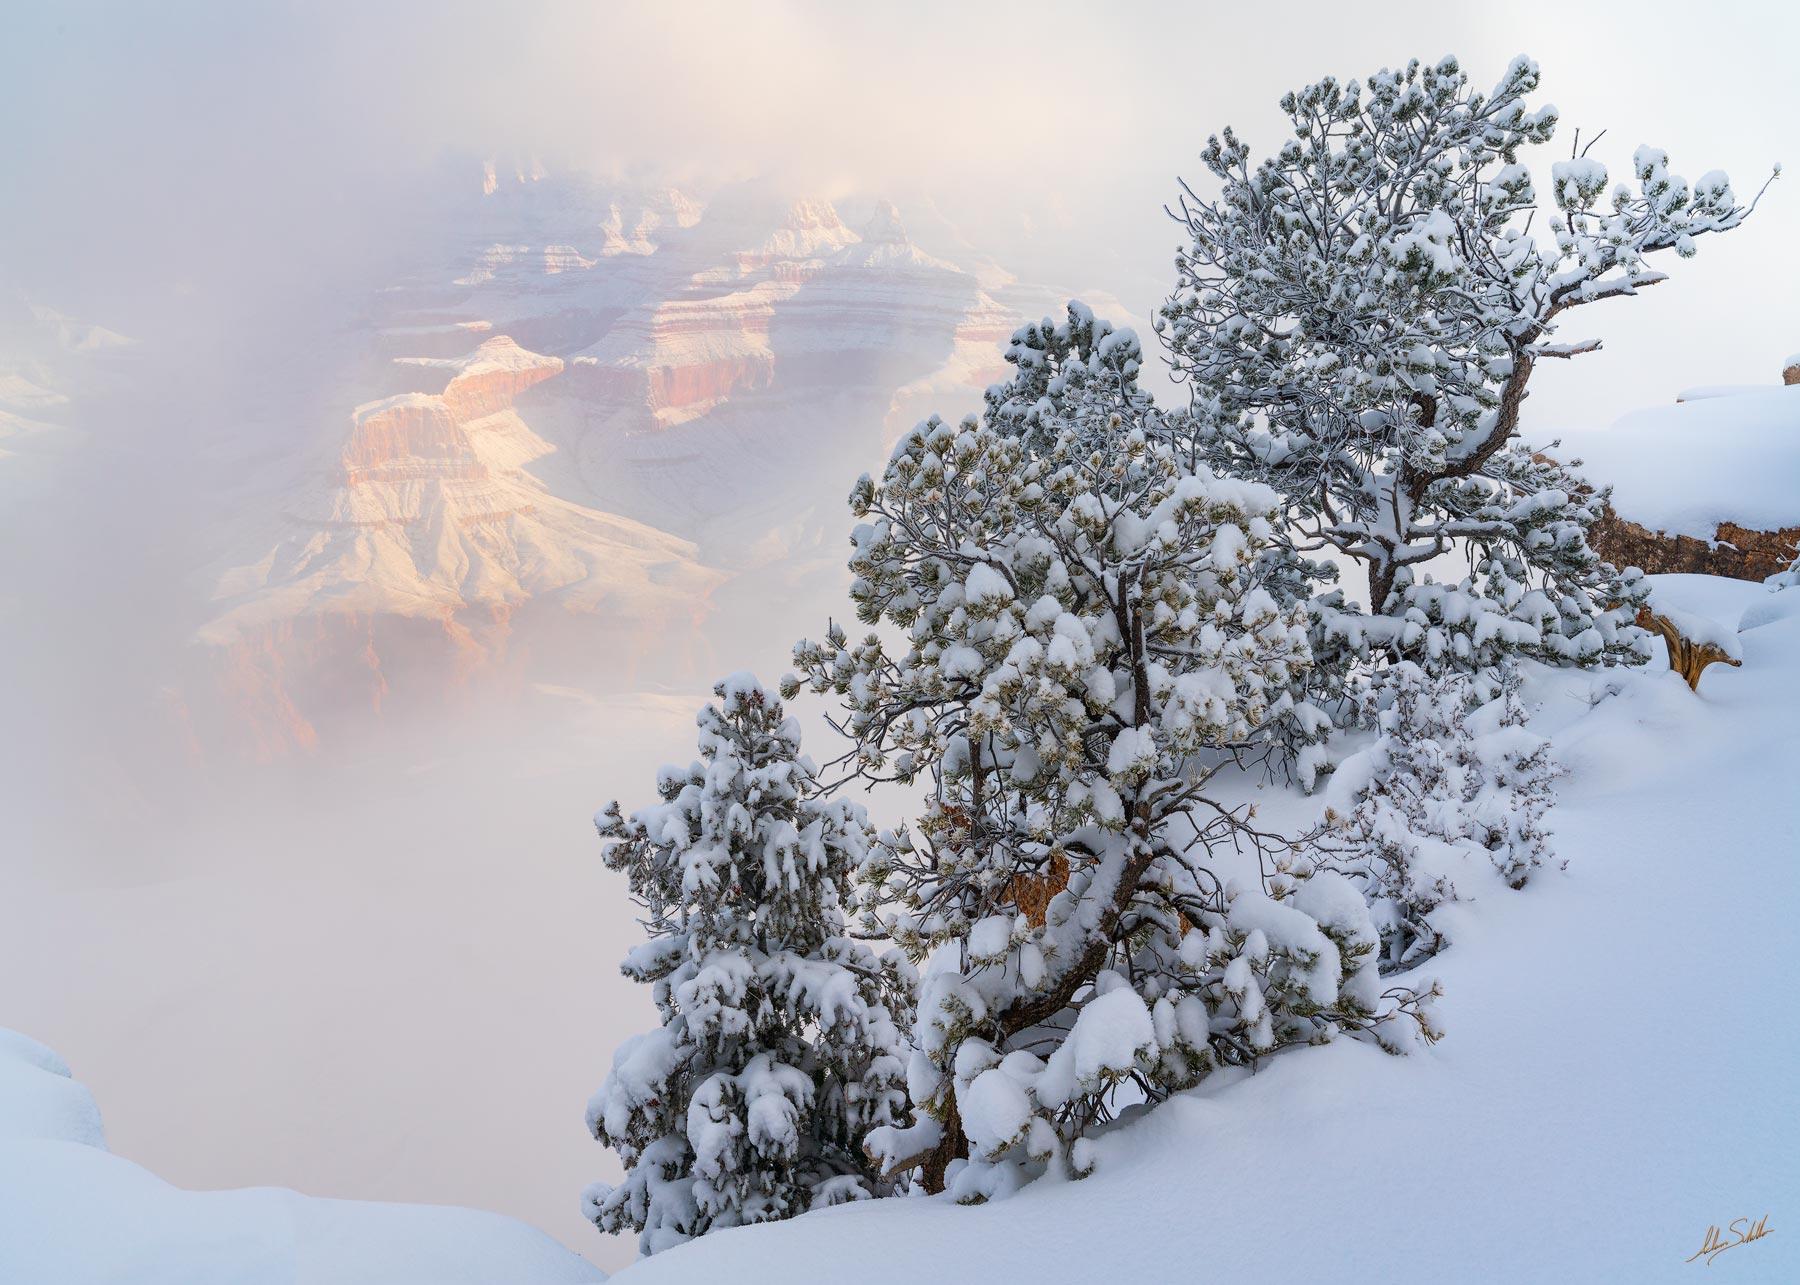 AZ, Arizona, Grand Canyon, Grand Canyon National Park, National Park, Snow, Snow at the Grand Canyon, South Rim, South Rim of the Grand Canyon, Southwest, Winter, Winter at the Grand Canyon, photo